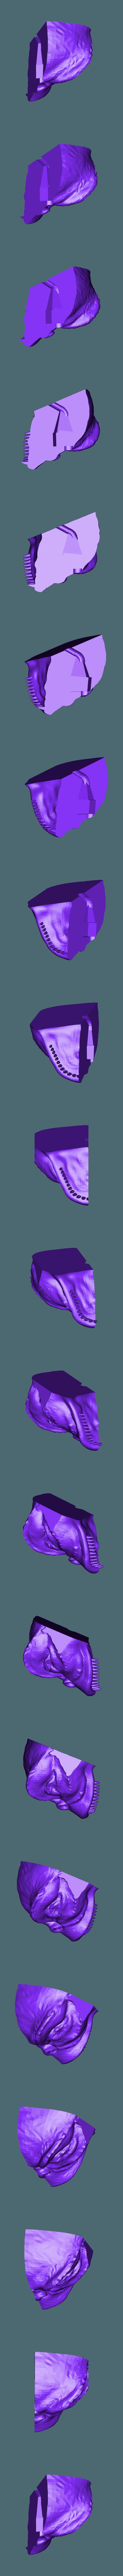 GADGETs head  pt1.stl Download free STL file GADGET the robotic Gremlin • 3D printing object, atarka3